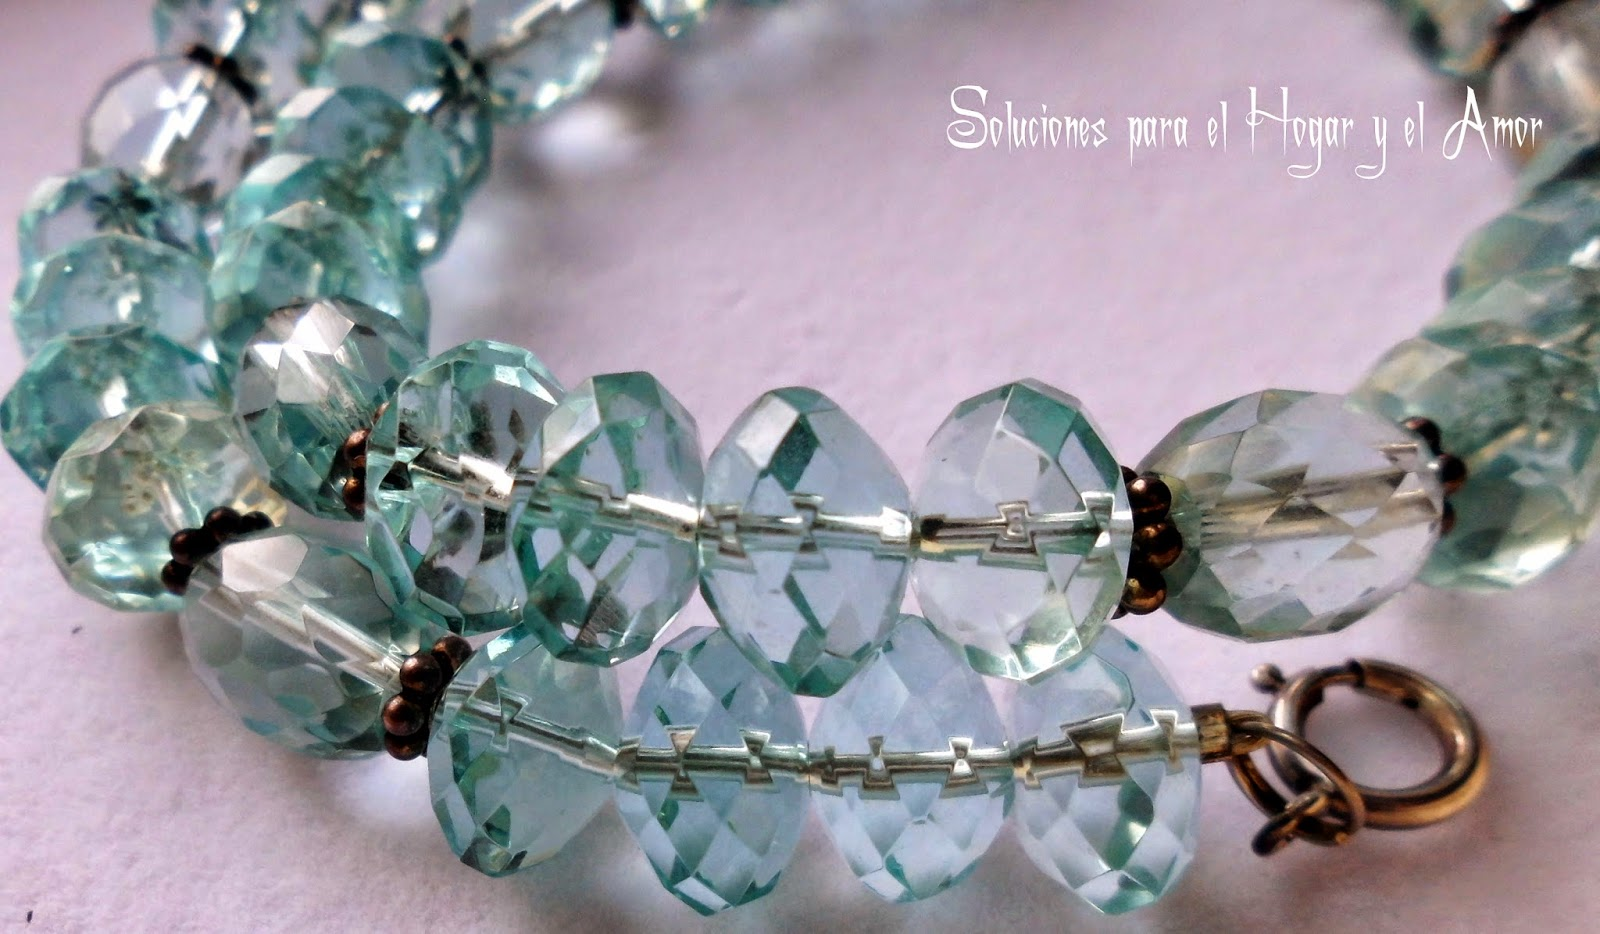 Cristales de Cuarzo azul celeste piedras facetadas